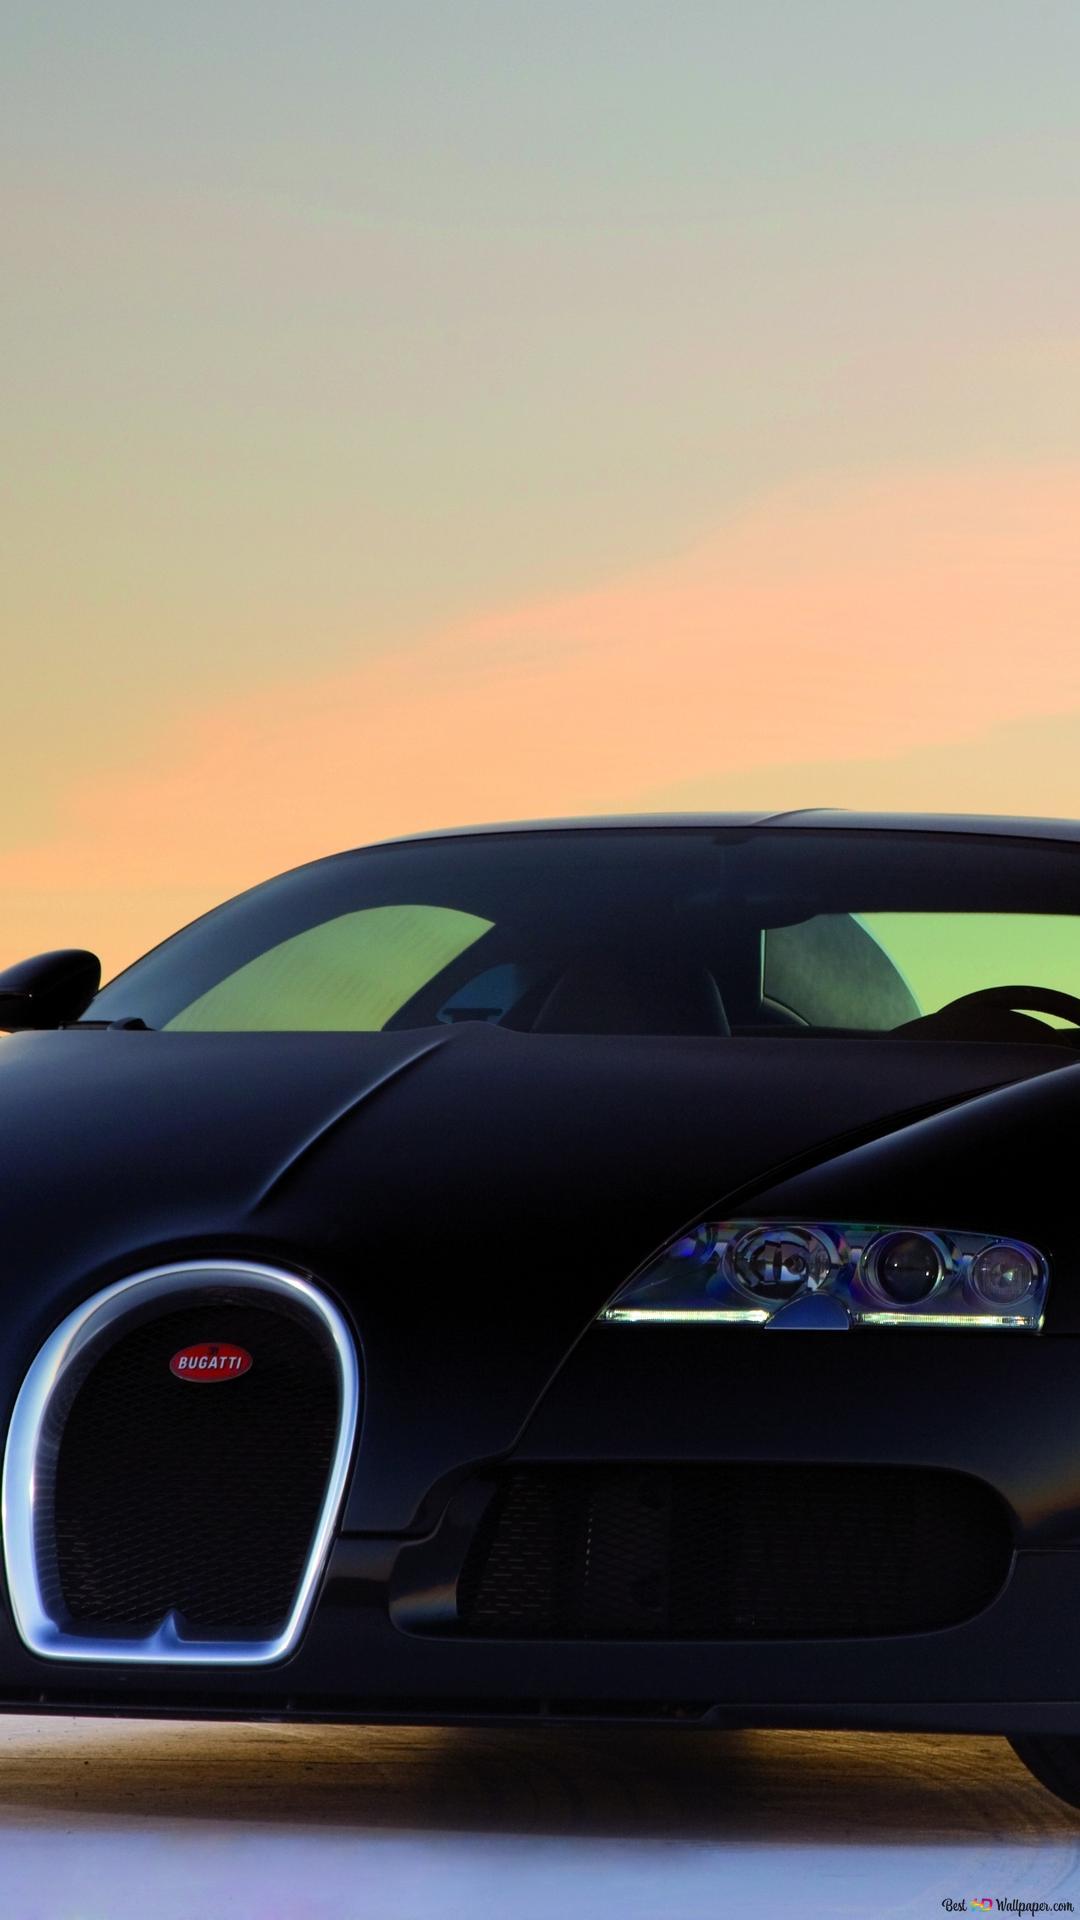 Classic Bugatti Veyron Hd Wallpaper Download